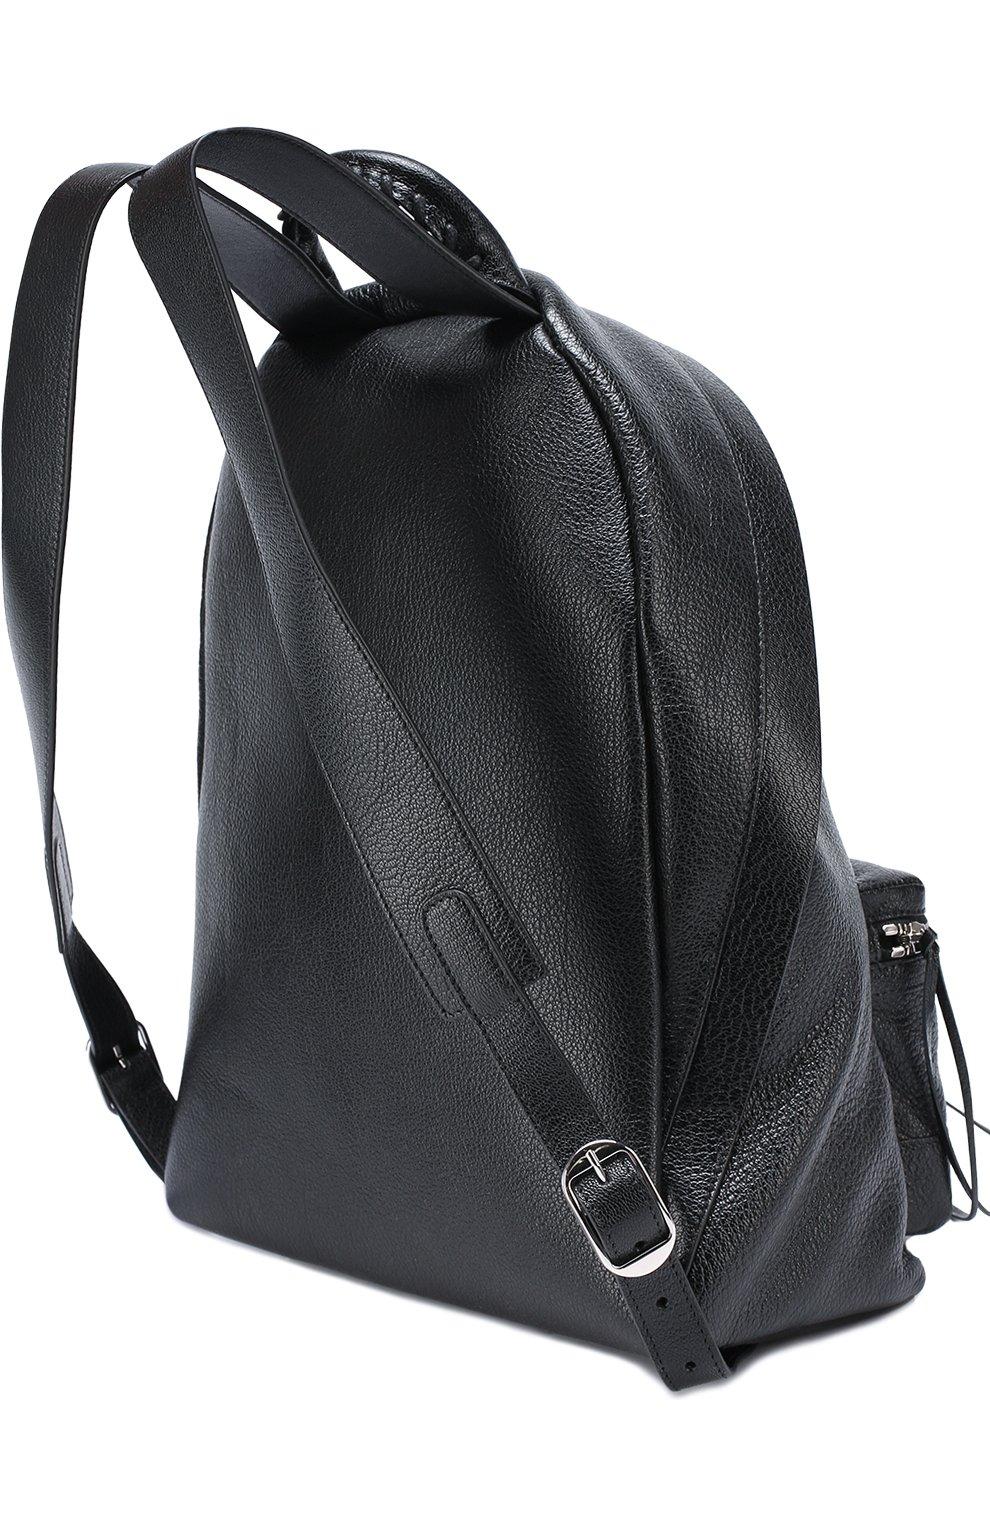 Кожаный рюкзак Metallic Edge | Фото №3